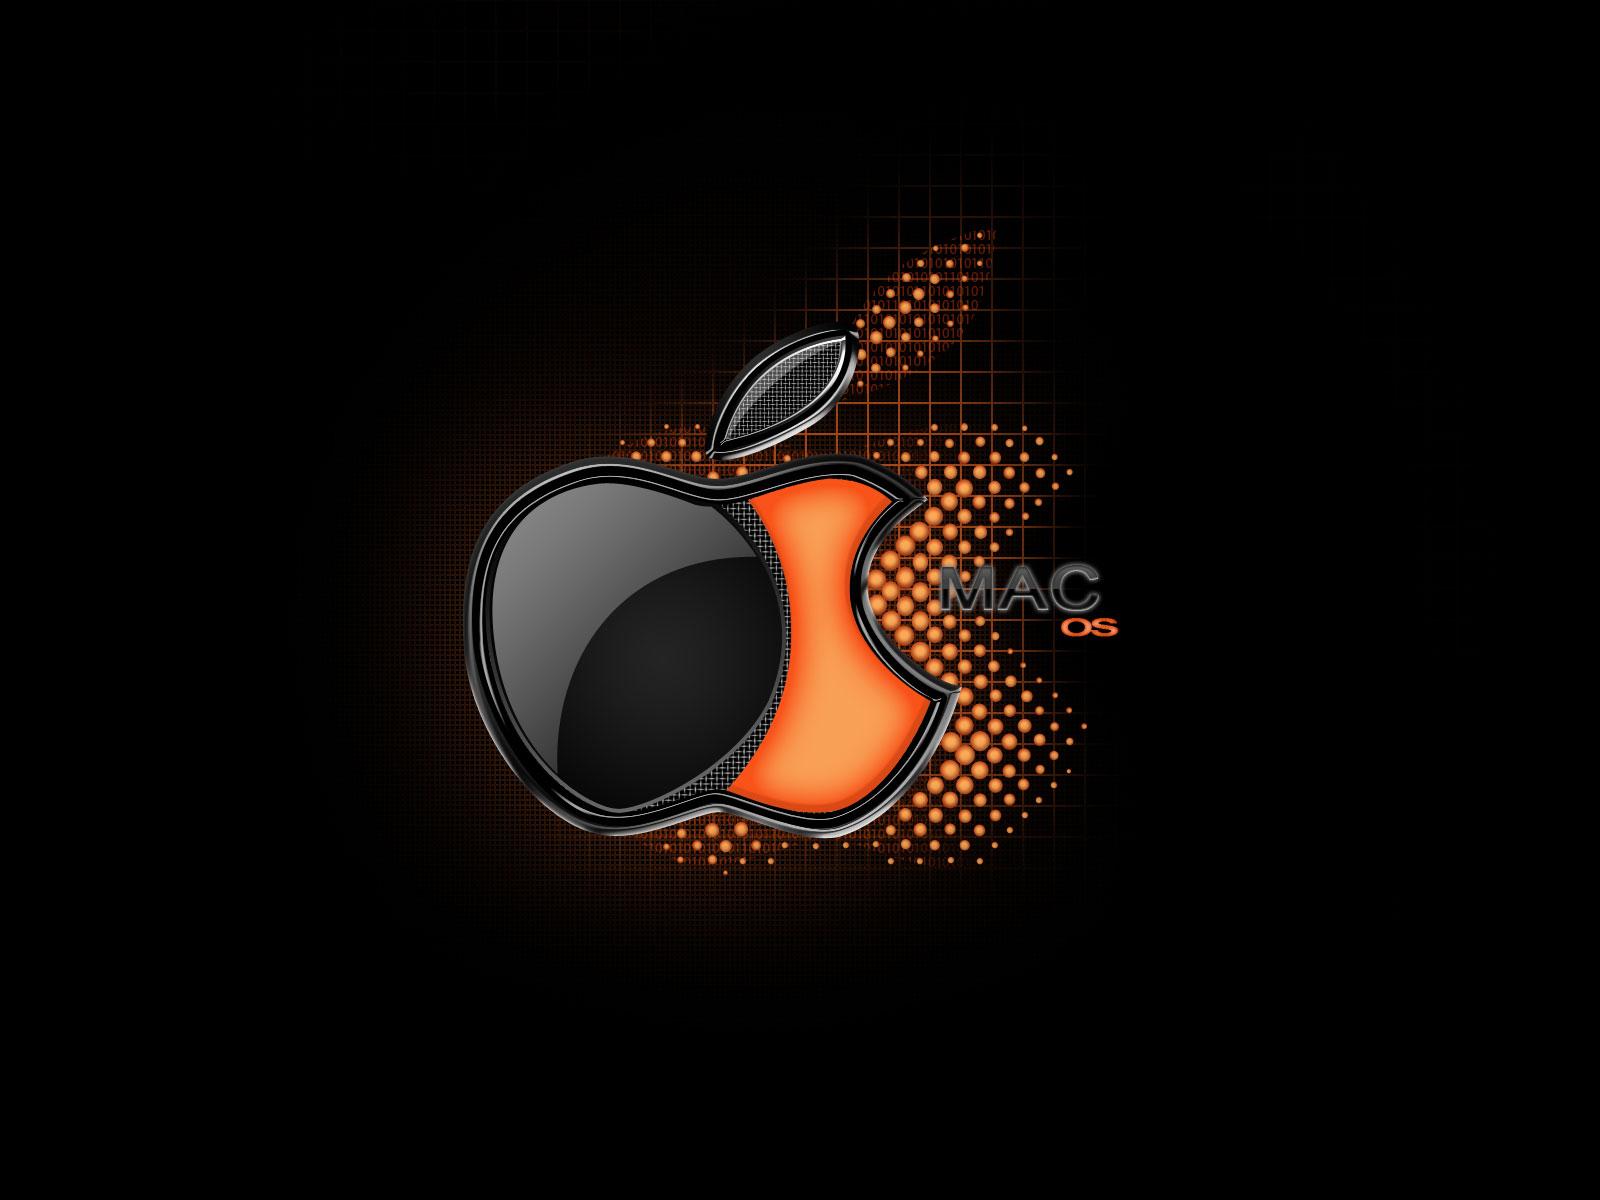 http://3.bp.blogspot.com/_YeR-Z-2WrGA/TPcCz00dFlI/AAAAAAAAABY/6MmFp8bbdFY/s1600/mac-os-x-wallpaper.jpg